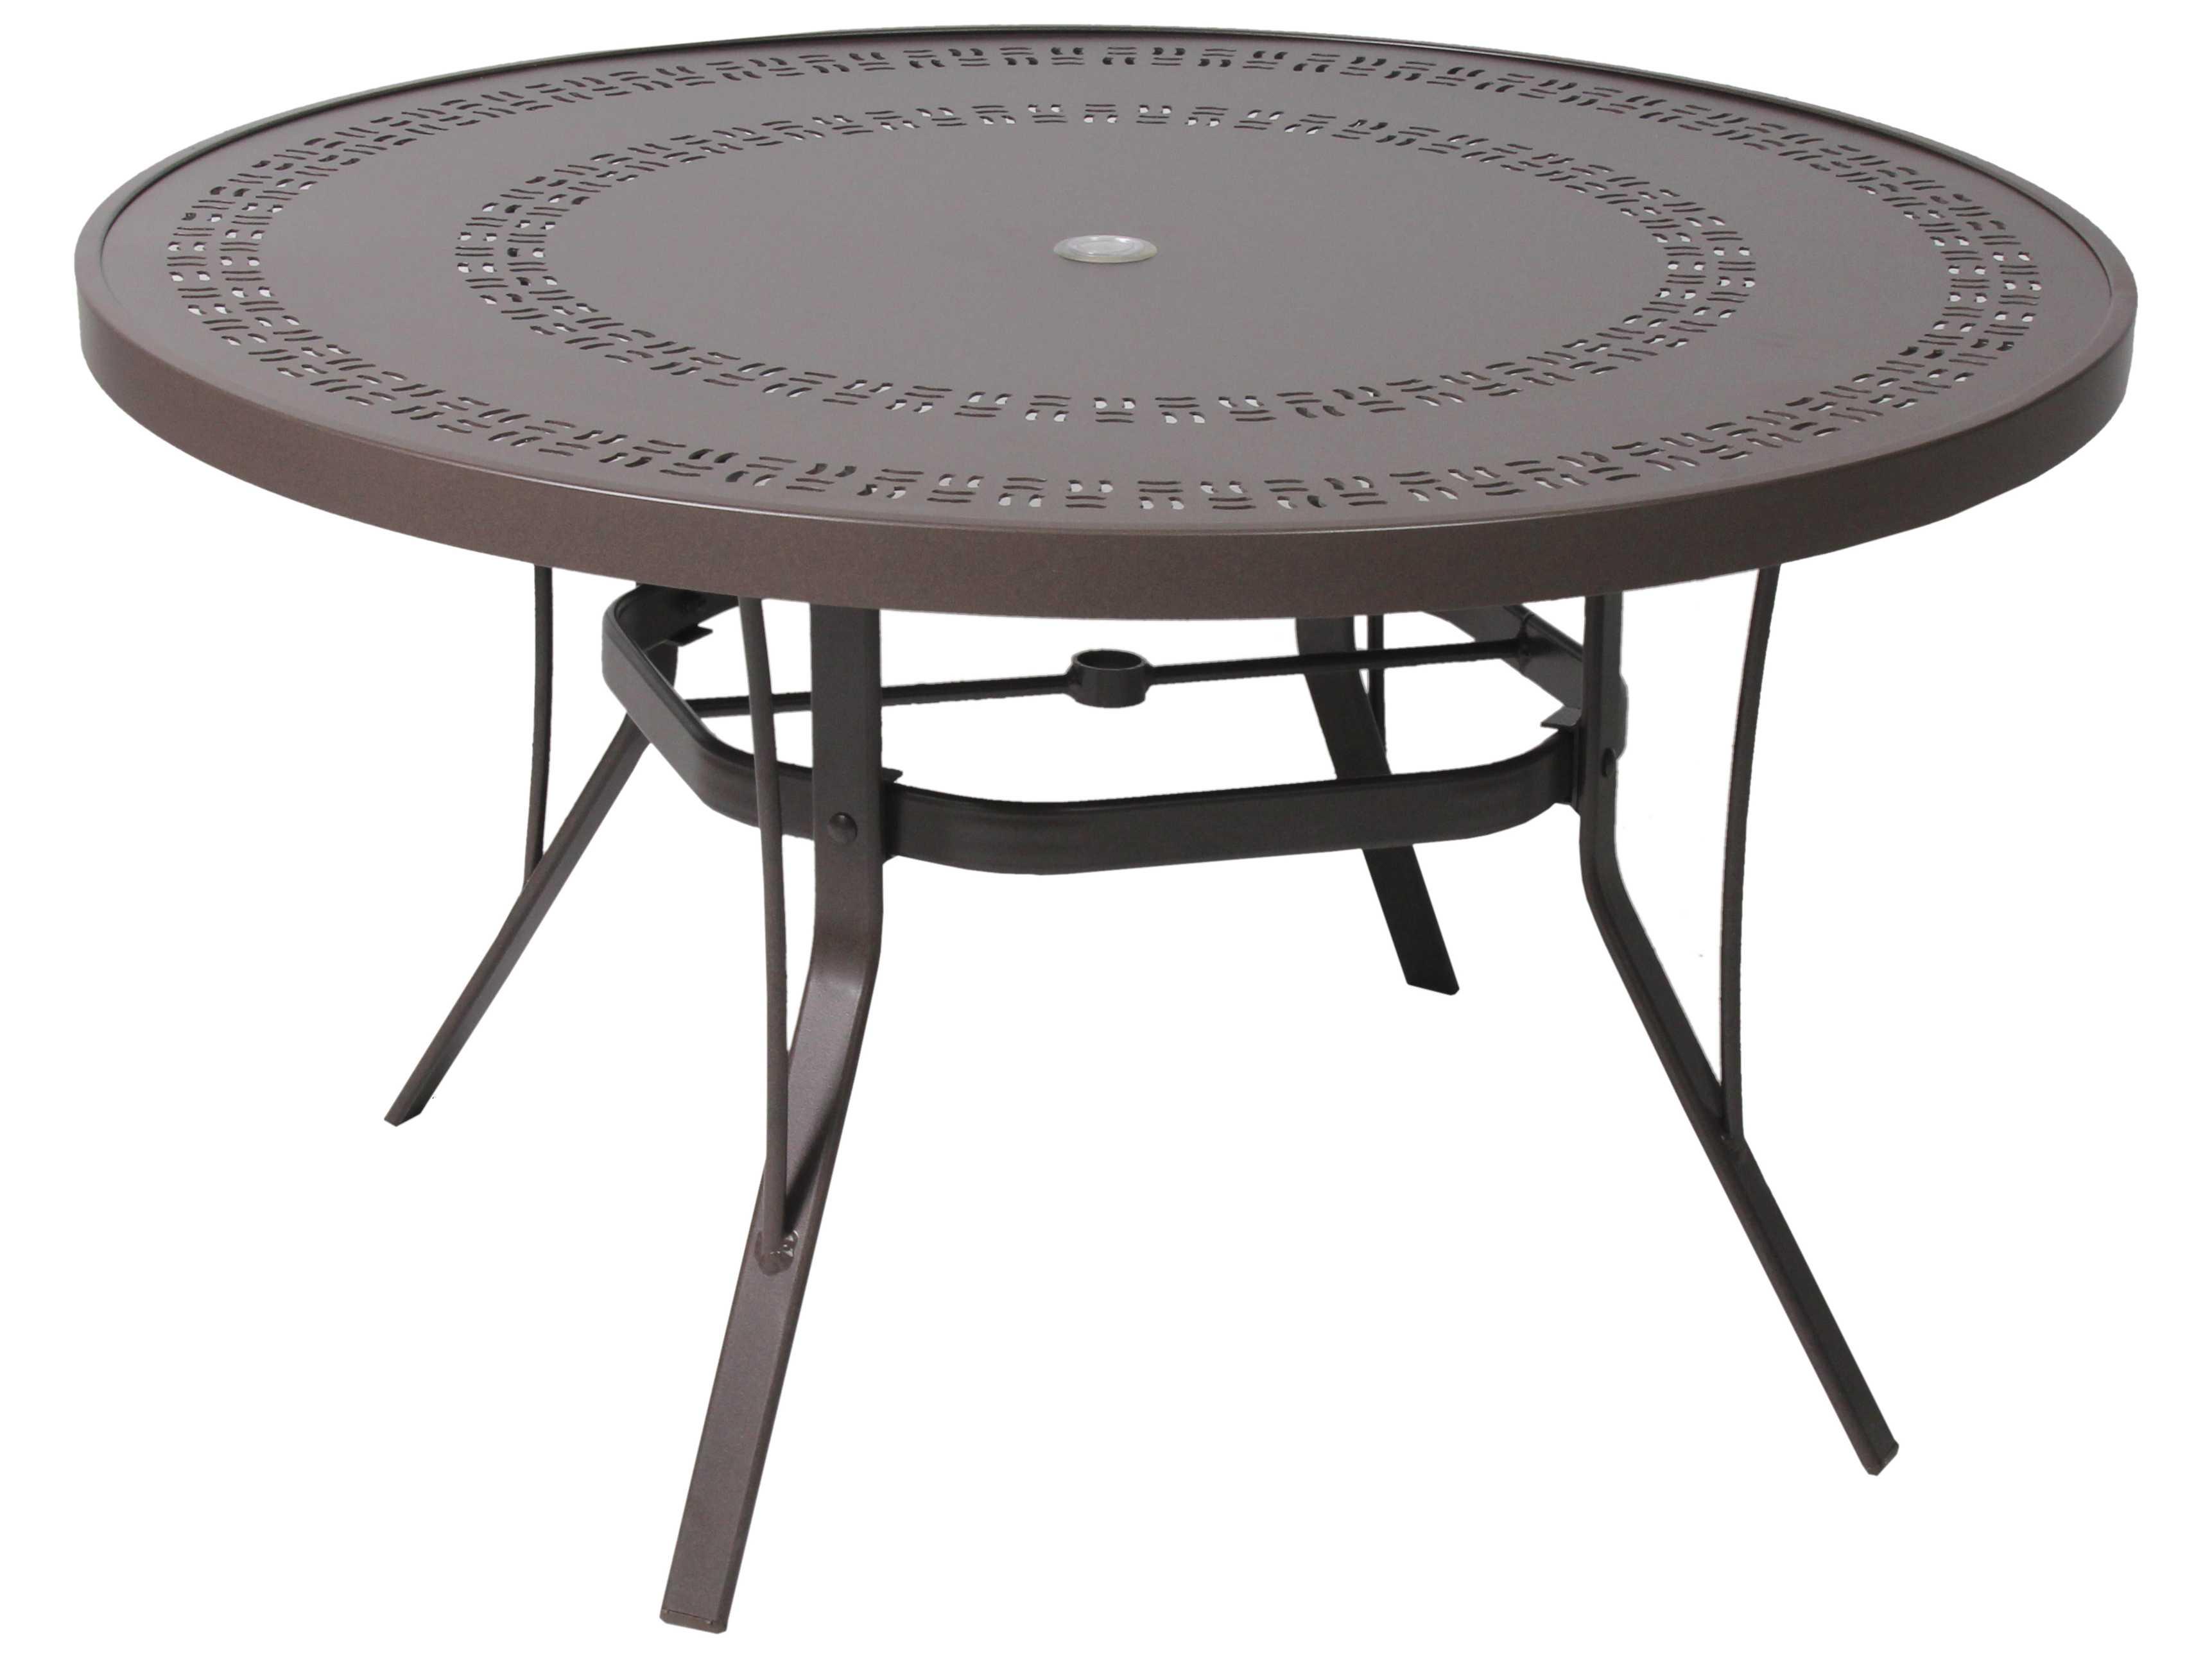 Suncoast patterned wave aluminum 48 39 39 round metal dining - Aluminium picnic table with umbrella ...